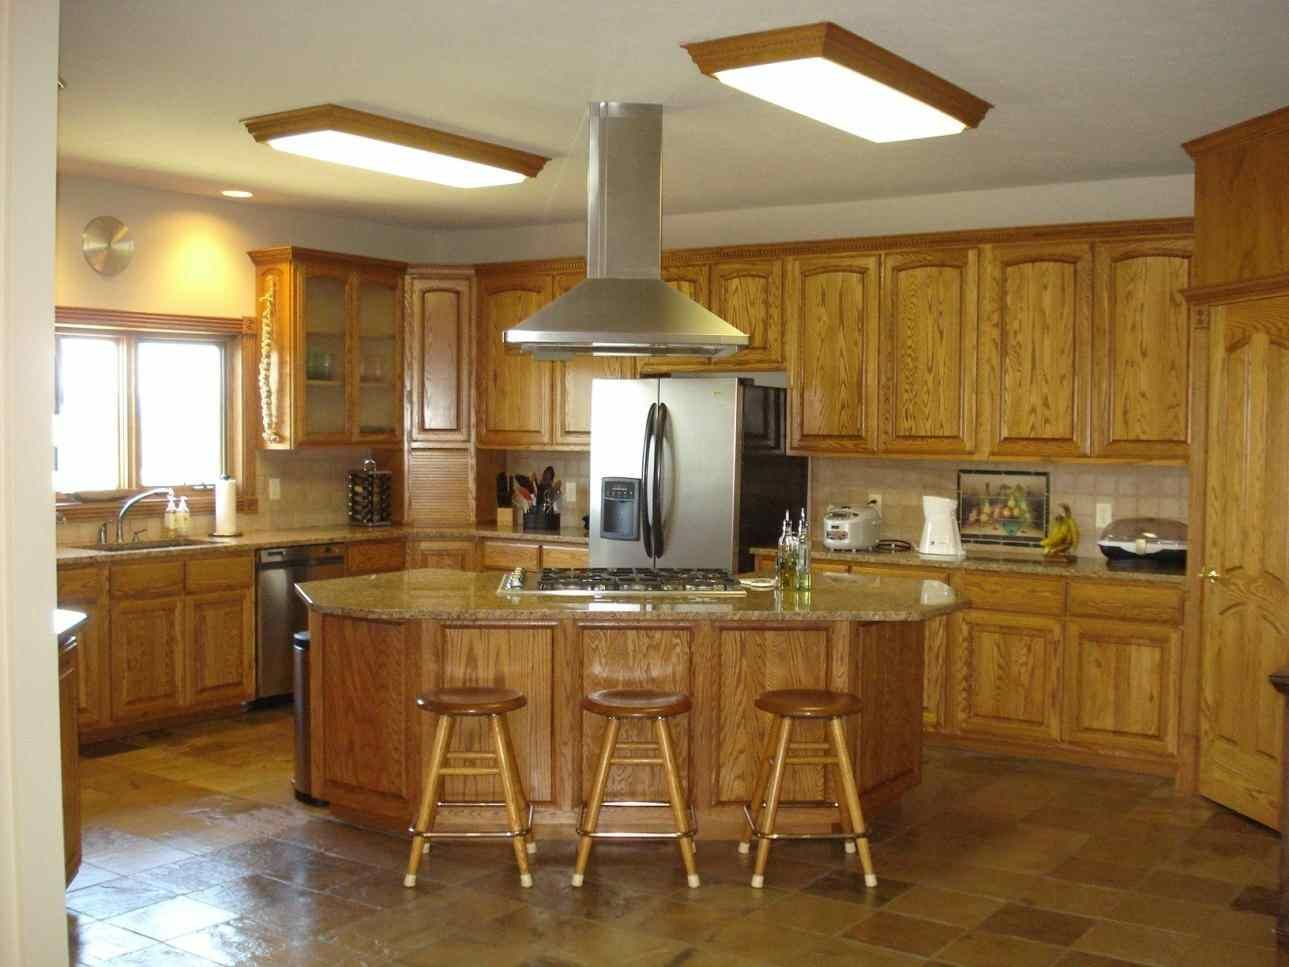 pin by gwen shapiro on paint wood floor kitchen light oak cabinets kitchen cabinets light wood on kitchen cabinets light wood id=11260